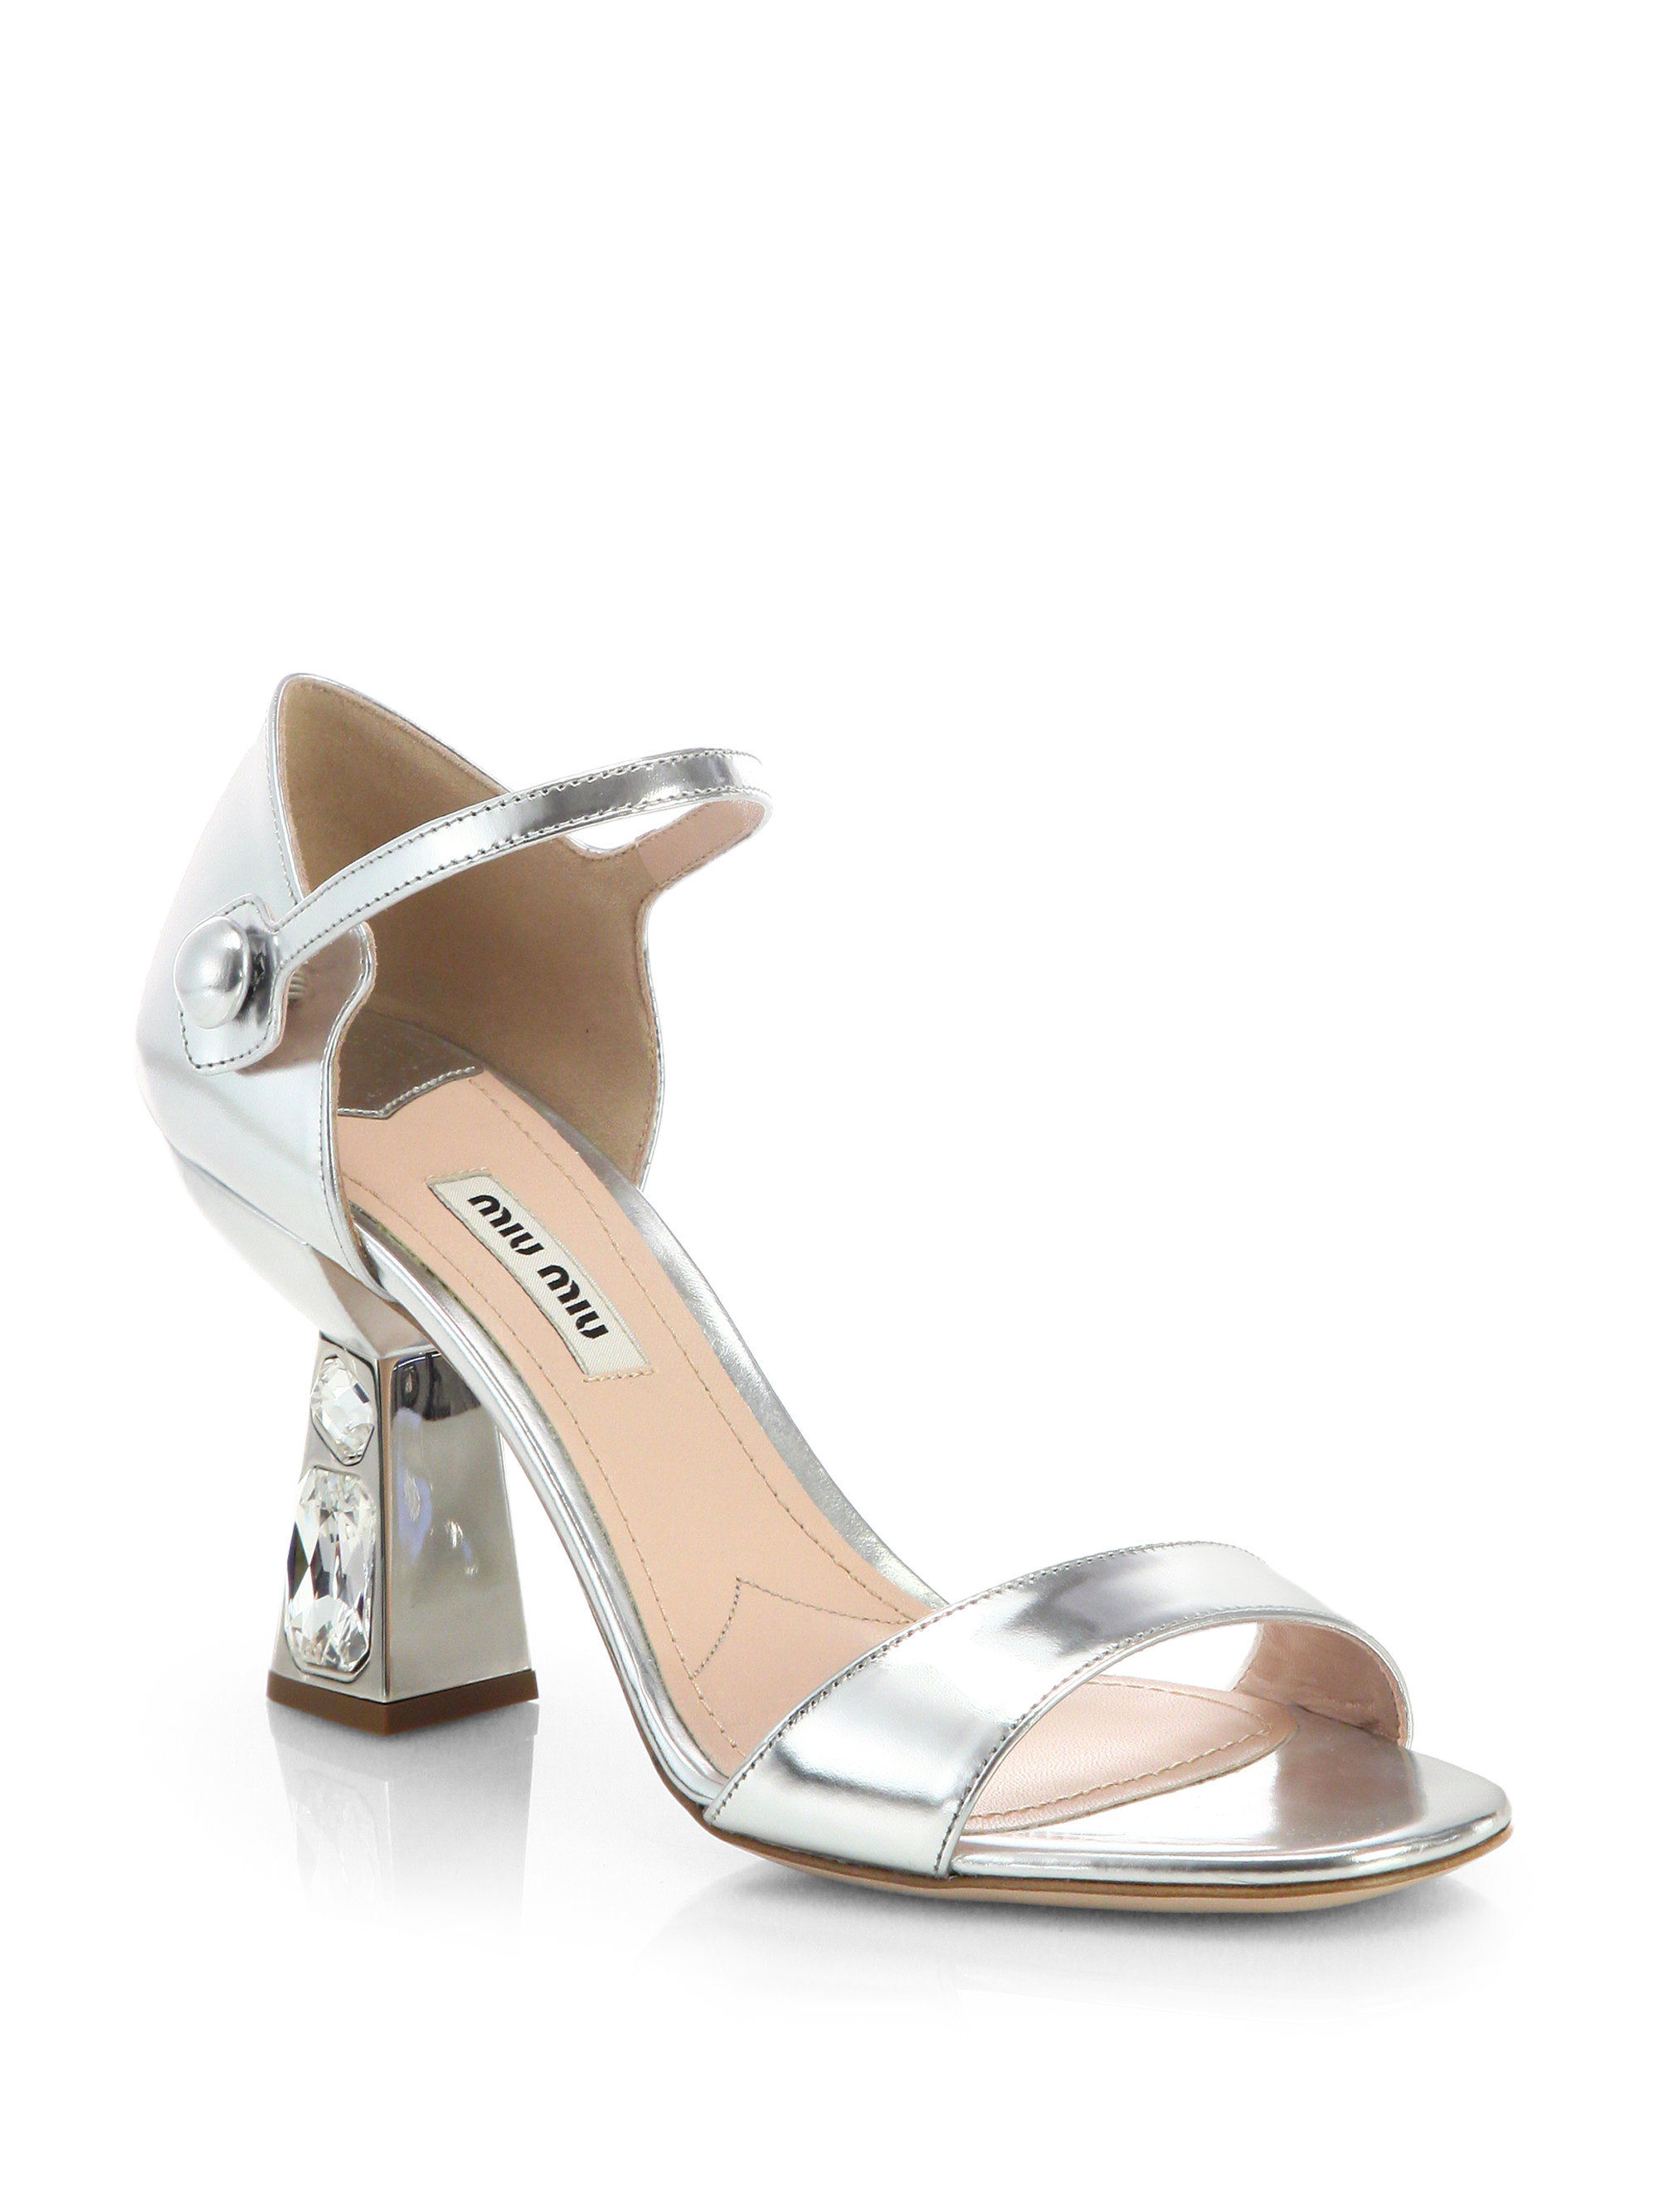 08dedb4d6fa1c8 Lyst - Miu Miu Metallic Leather Jeweled-Heel Sandals in Metallic